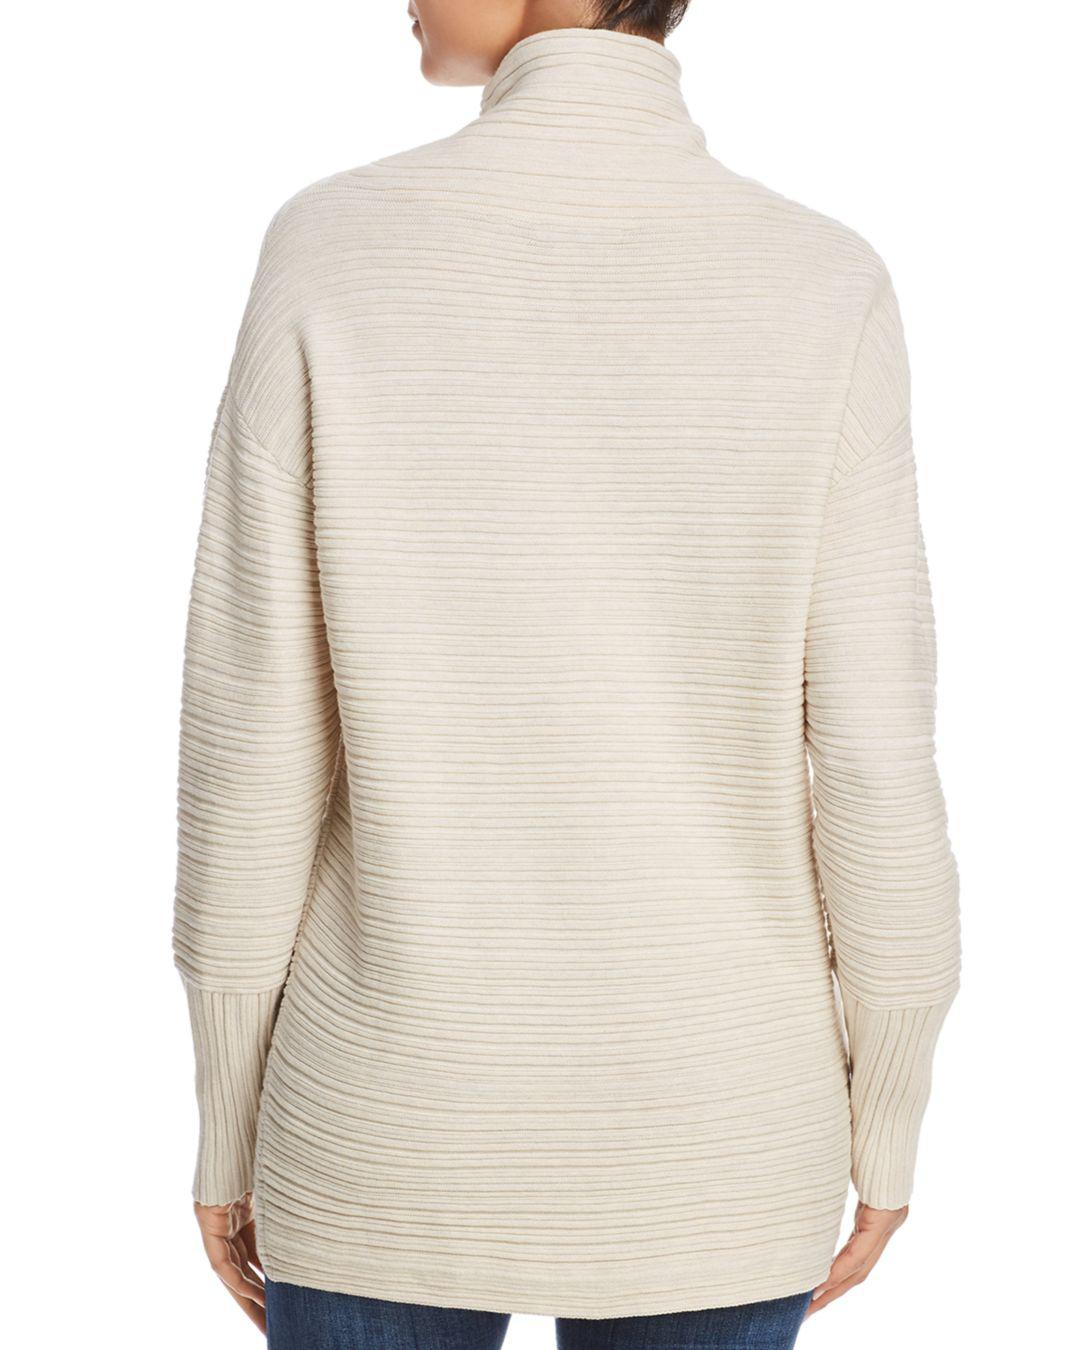 Lyst Niczoe Niczoe Fall Nights Ribbed Sweater